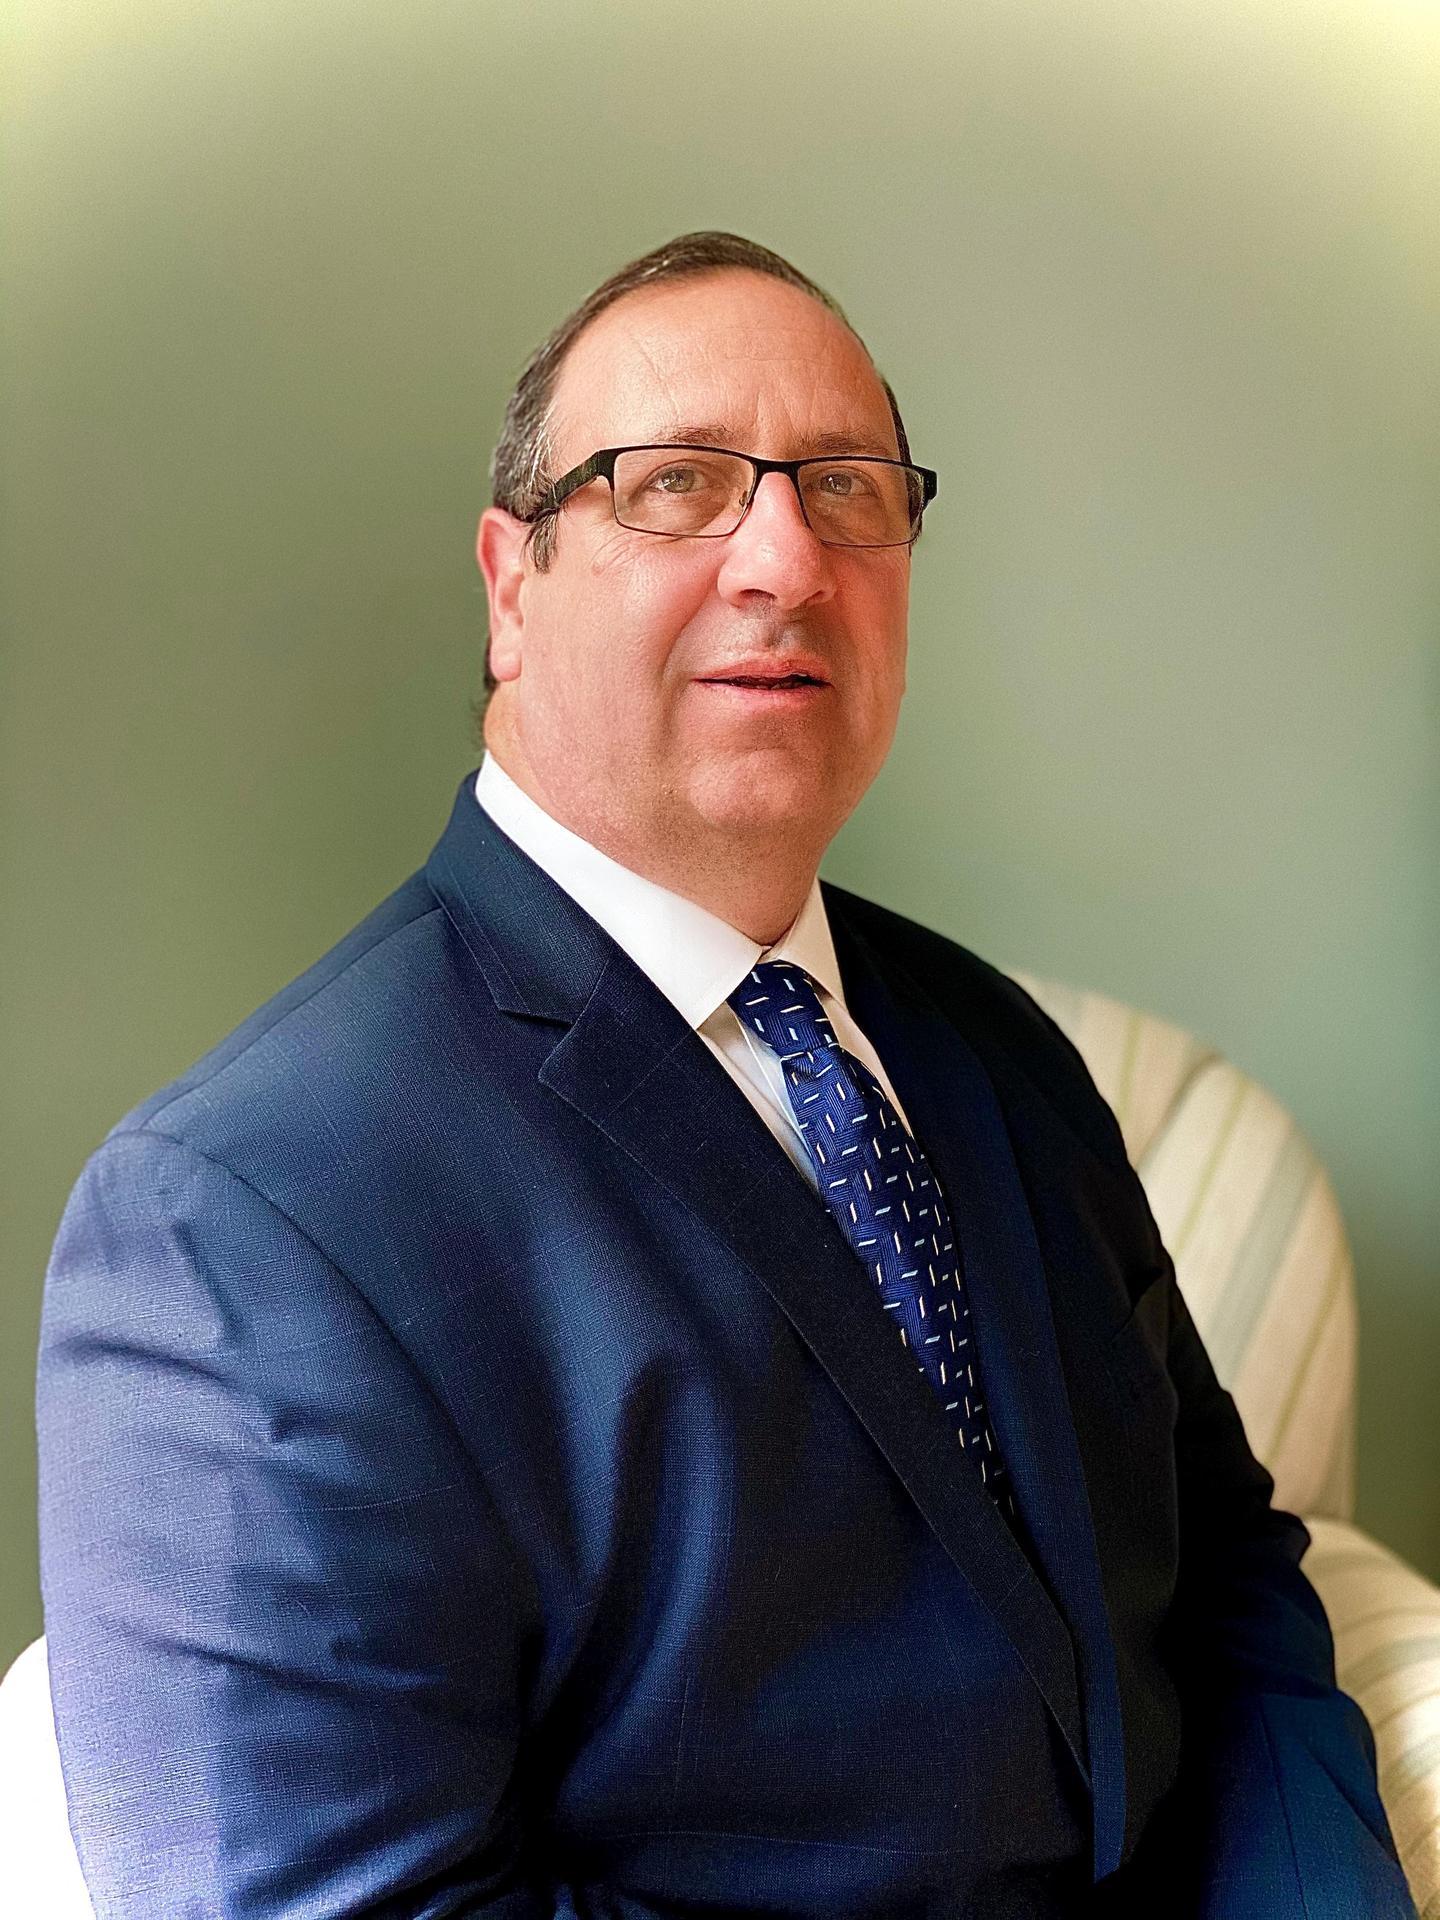 Image of Michael D'Antico